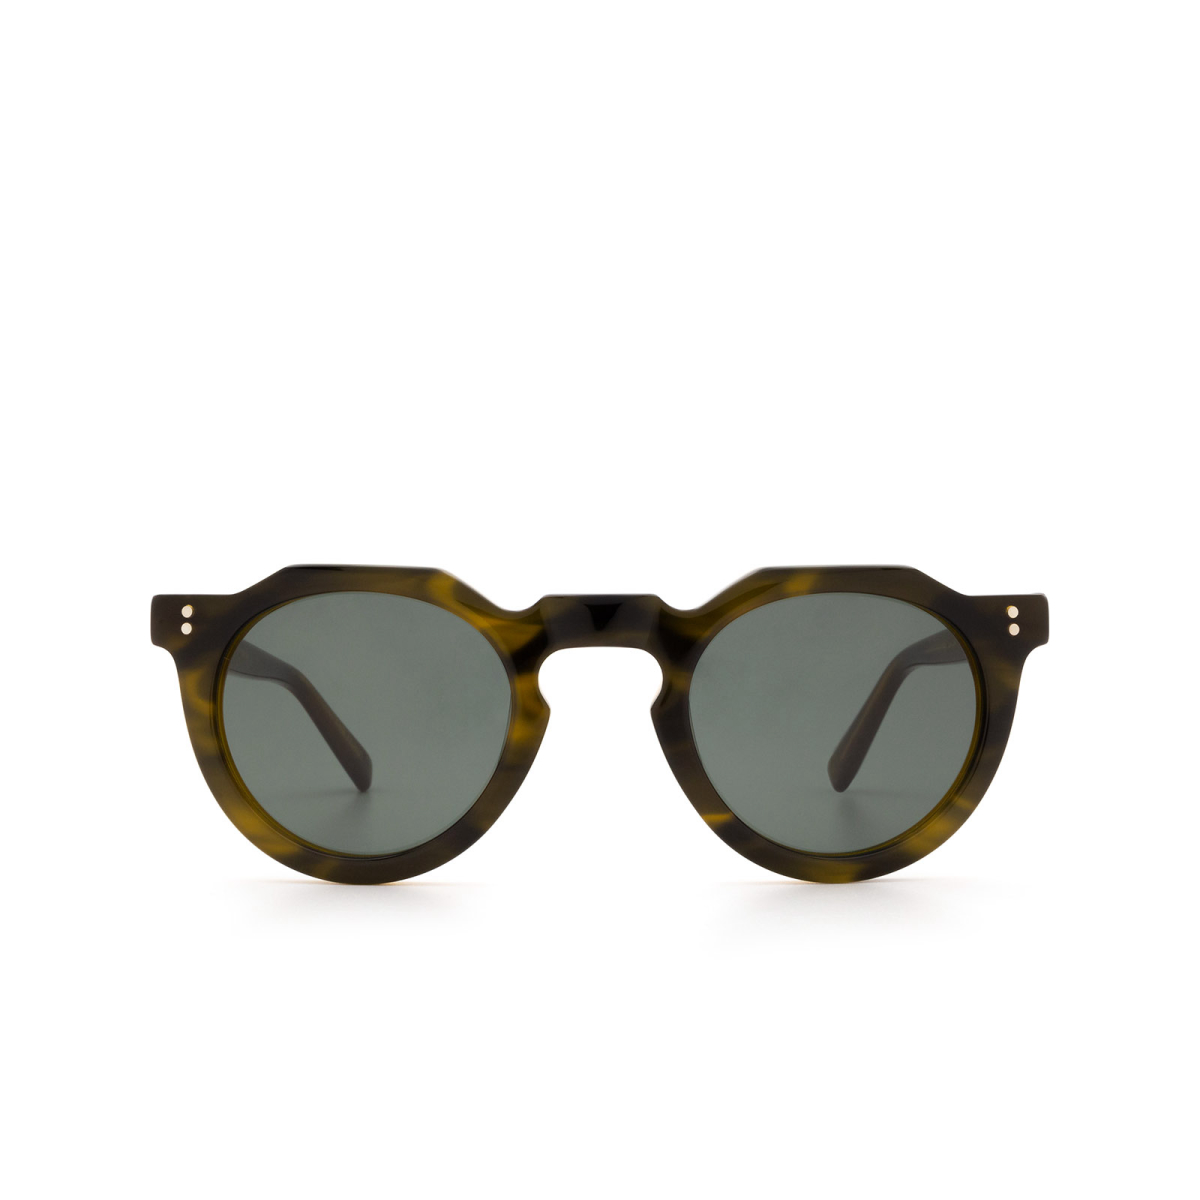 Lesca® Irregular Sunglasses: Picas color Khaki.